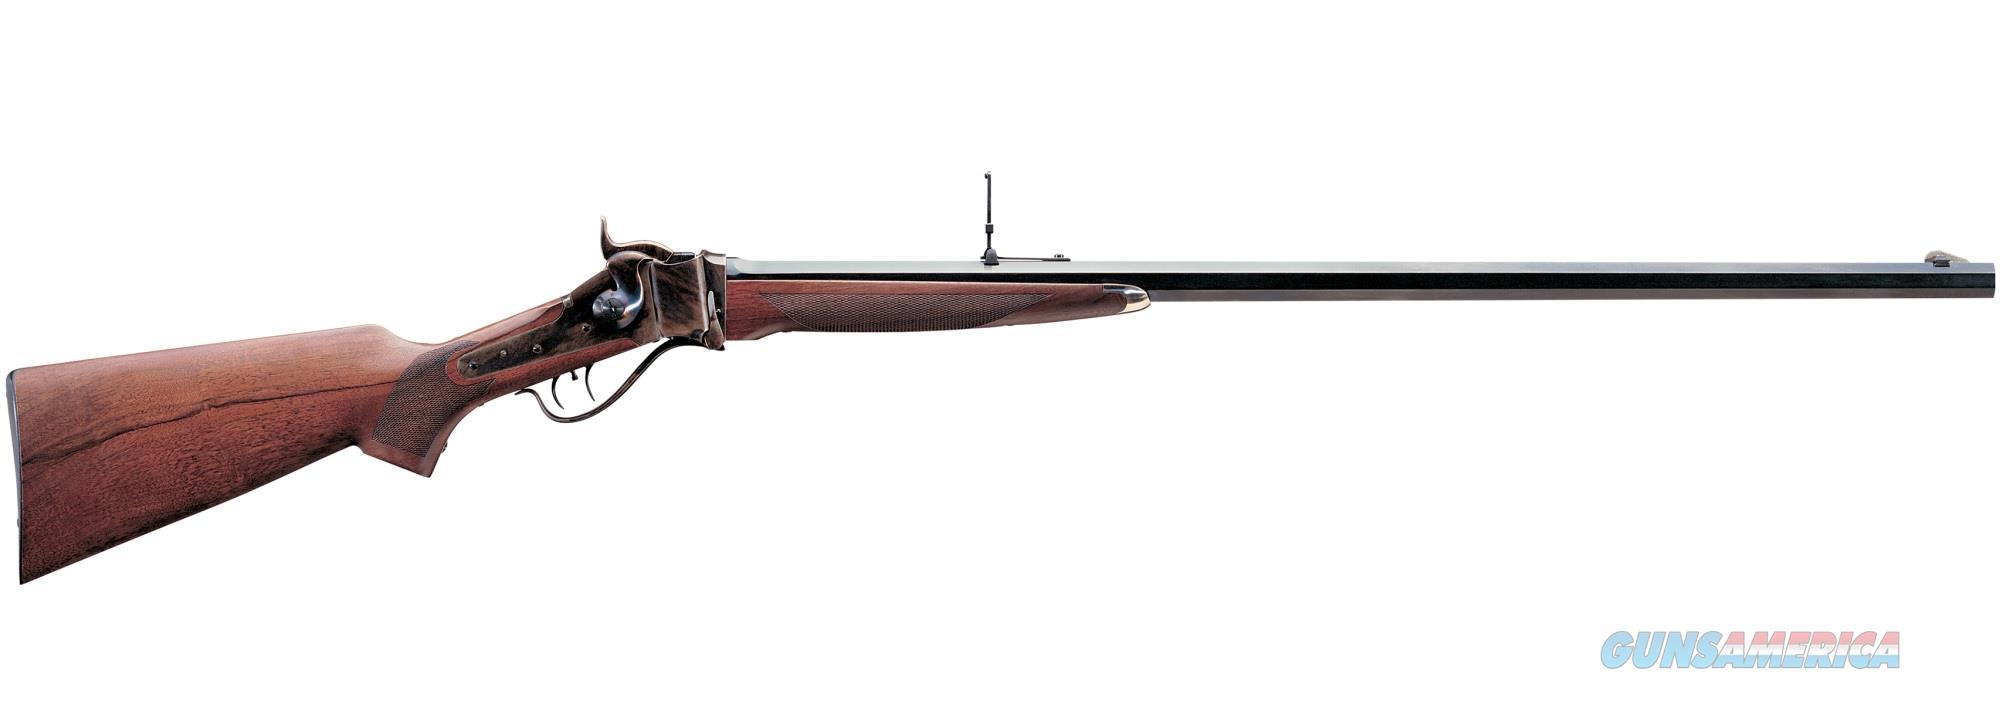 "Uberti 1874 Special Sharps Rifle .45-70 Govt 32"" Single Shot 71001   Guns > Rifles > Uberti Rifles > Single Shot"